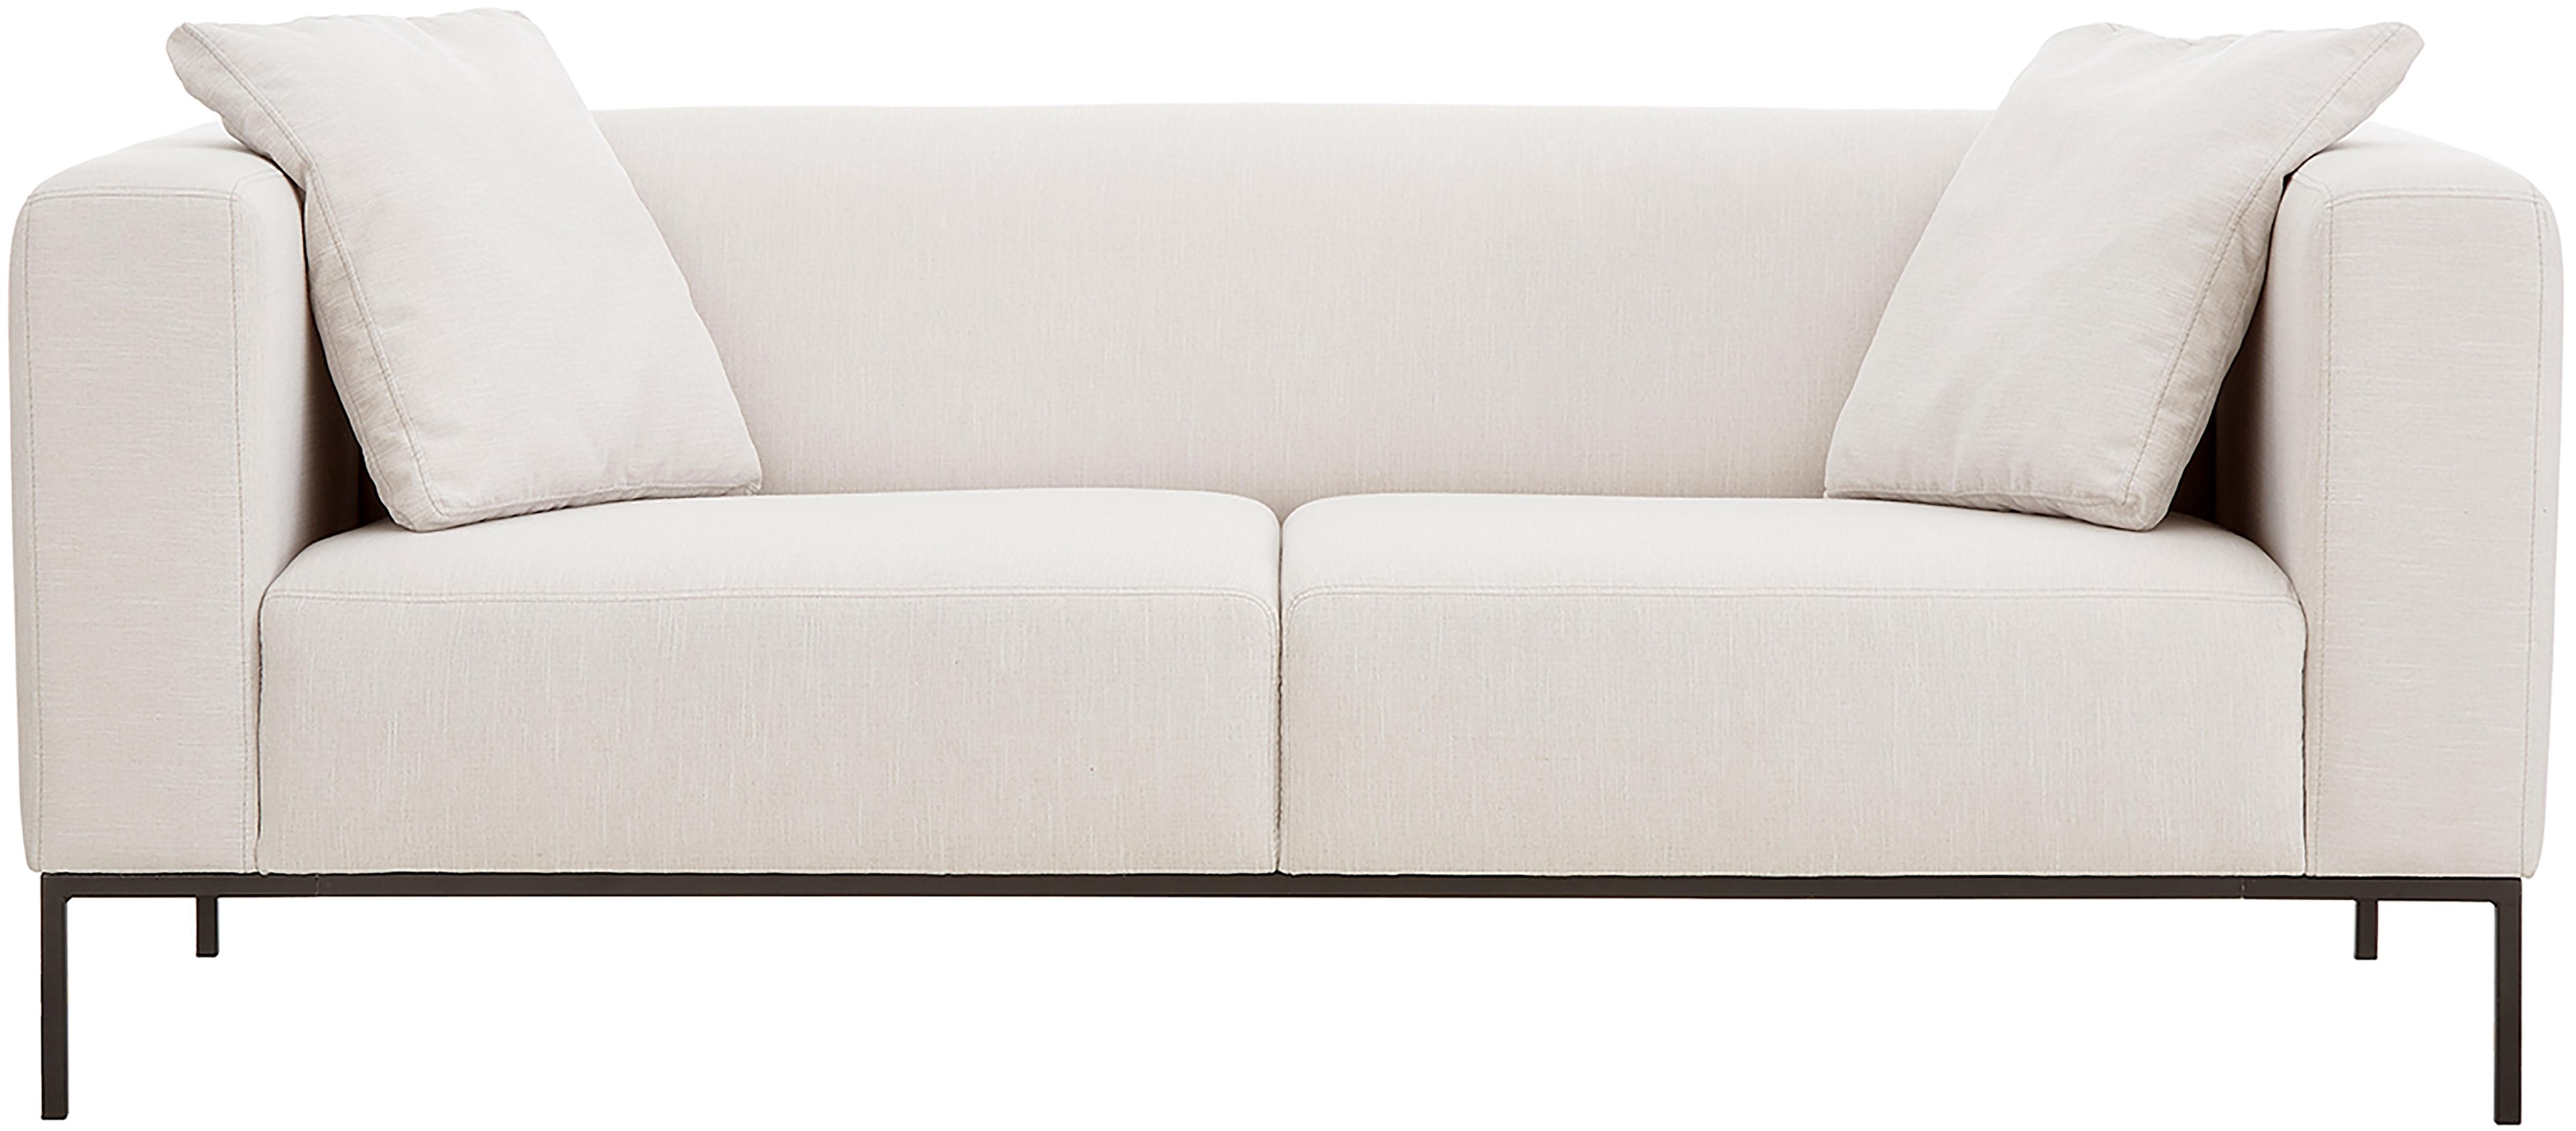 Sofa Carrie (3-Sitzer), Bezug: Polyester 50.000 Scheuert, Gestell: Spanholz, Hartfaserplatte, Webstoff Beige, B 202 x T 86 cm